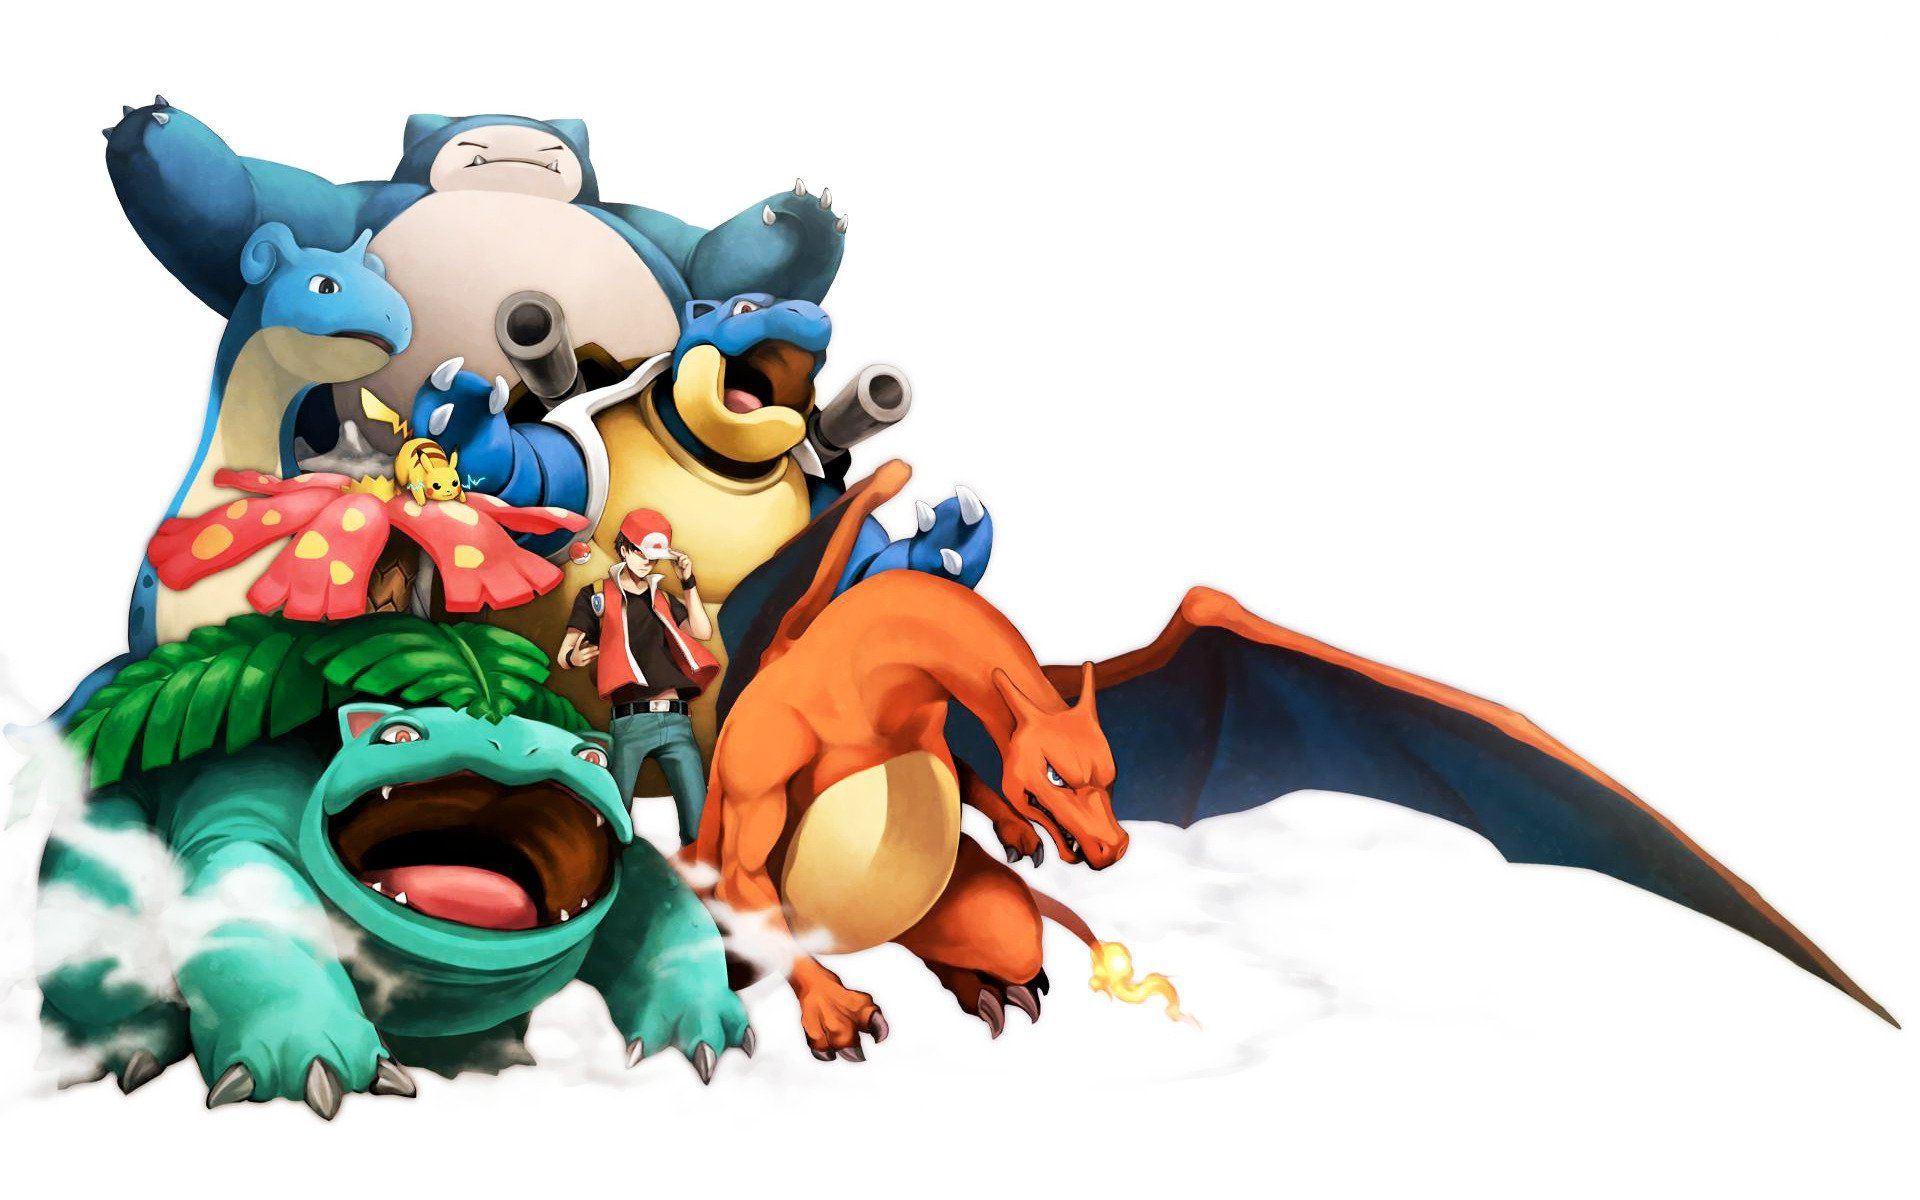 Blastoise Background Hd Pokemon Trainer Red Pokemon Charizard